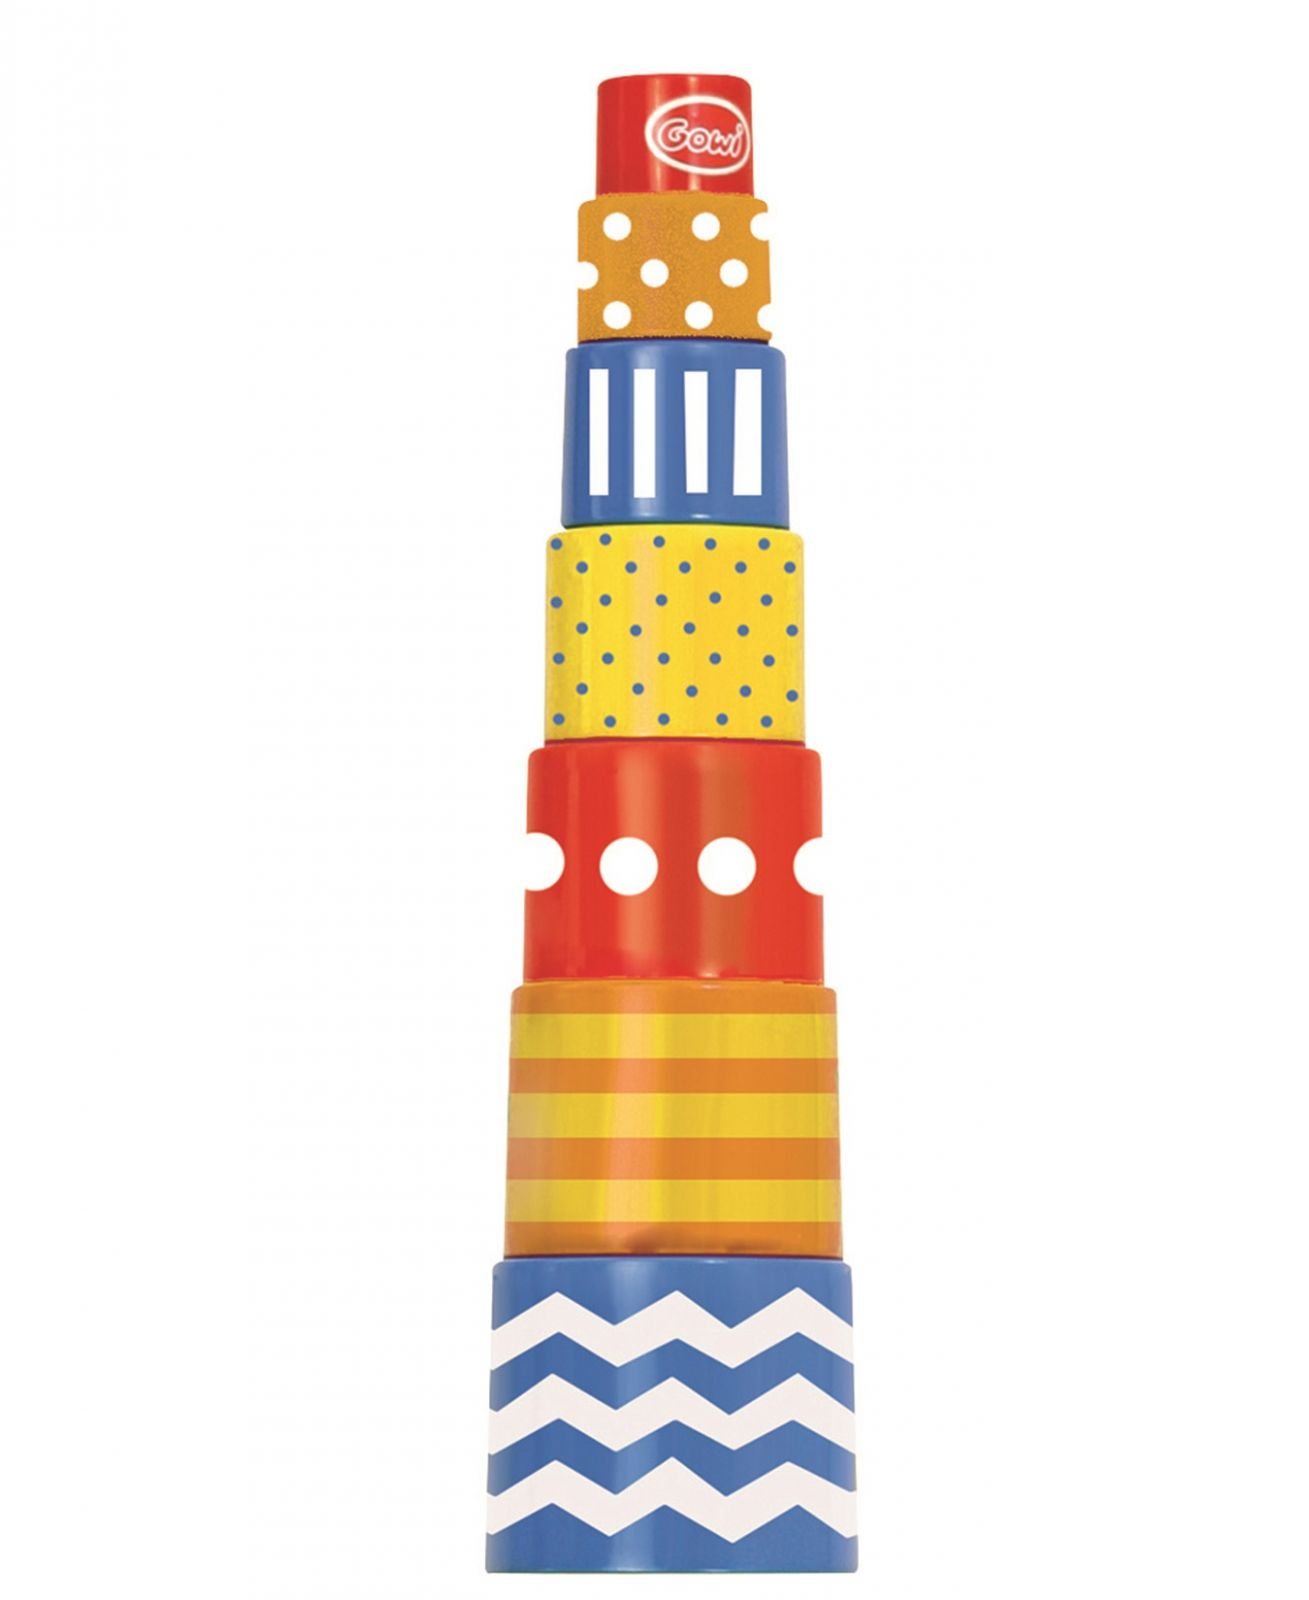 Dřevěné hračky Gowi Retro pyramida 7dílků